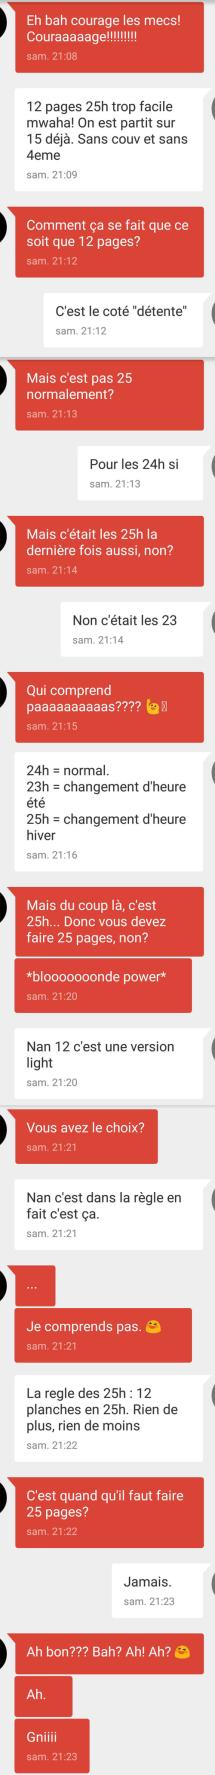 25hbd-bambou-sms